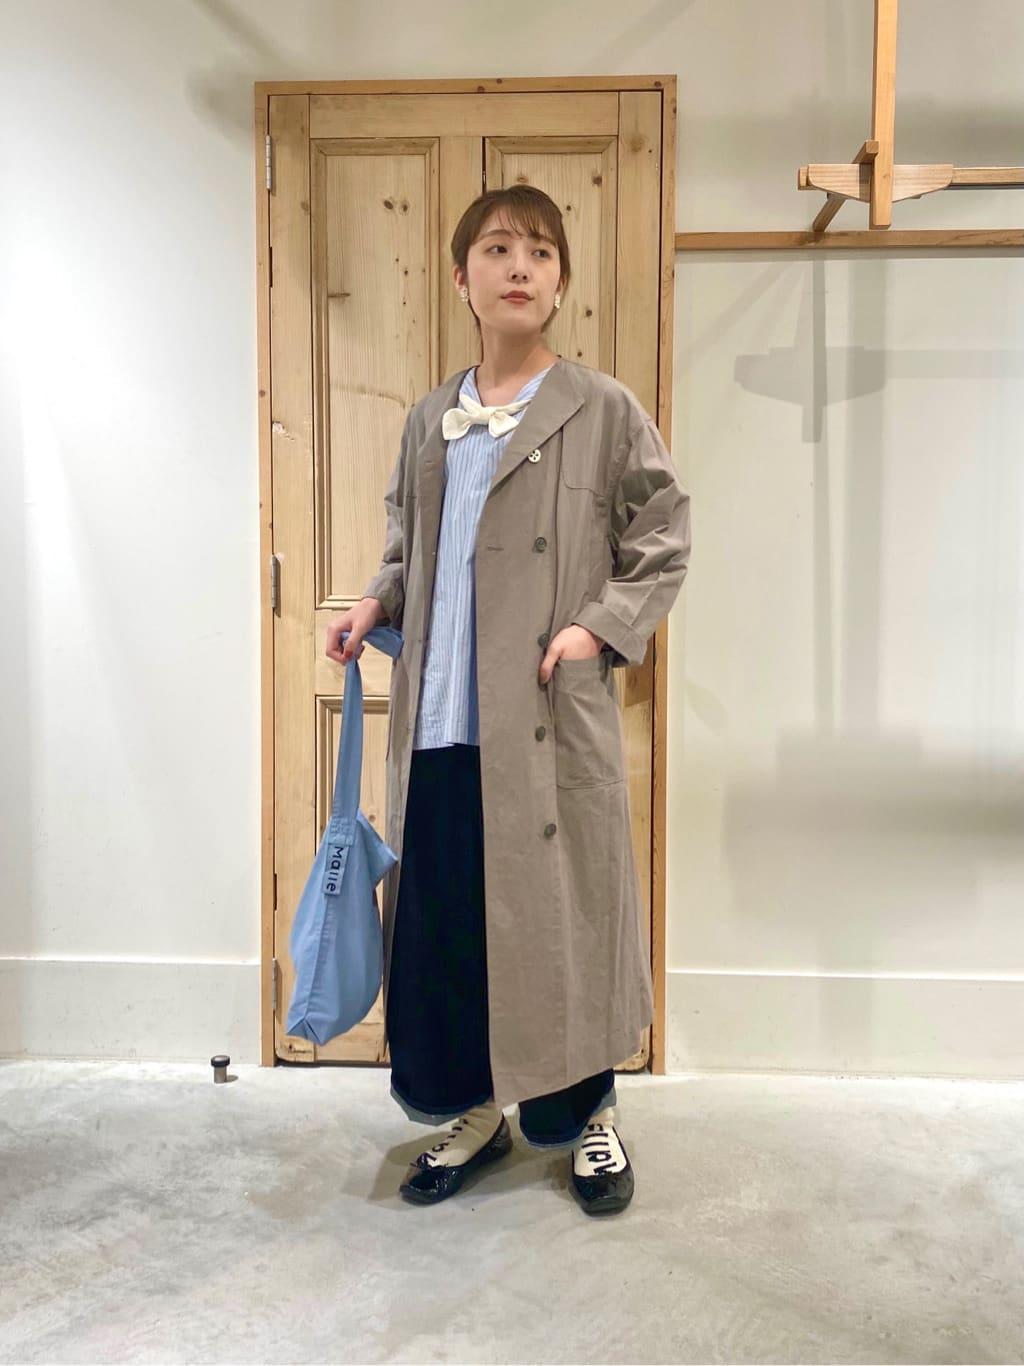 Malle chambre de charme 調布パルコ 身長:160cm 2021.09.28